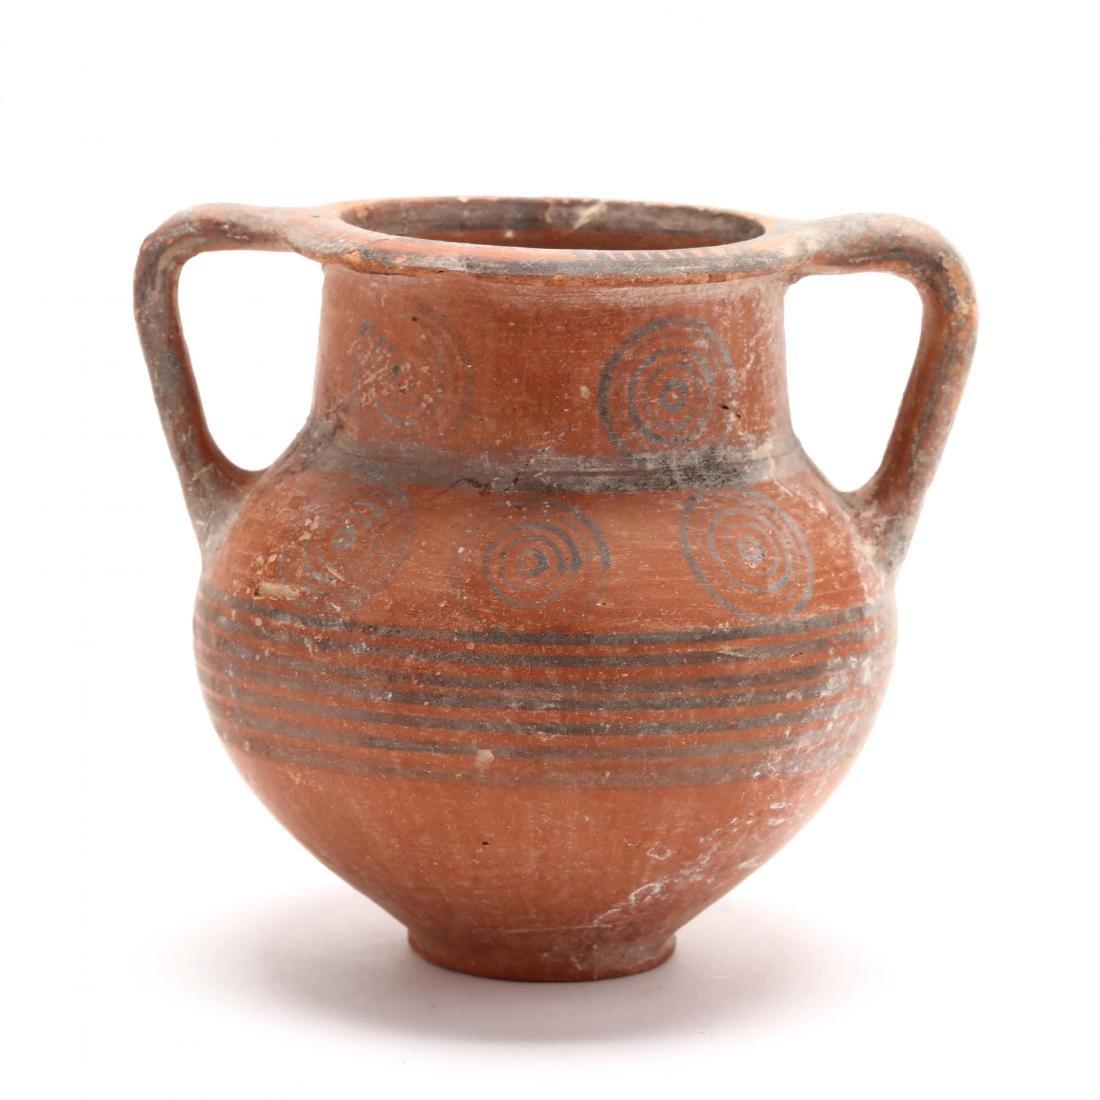 Cypro-Archaic Footed Amphoriskos